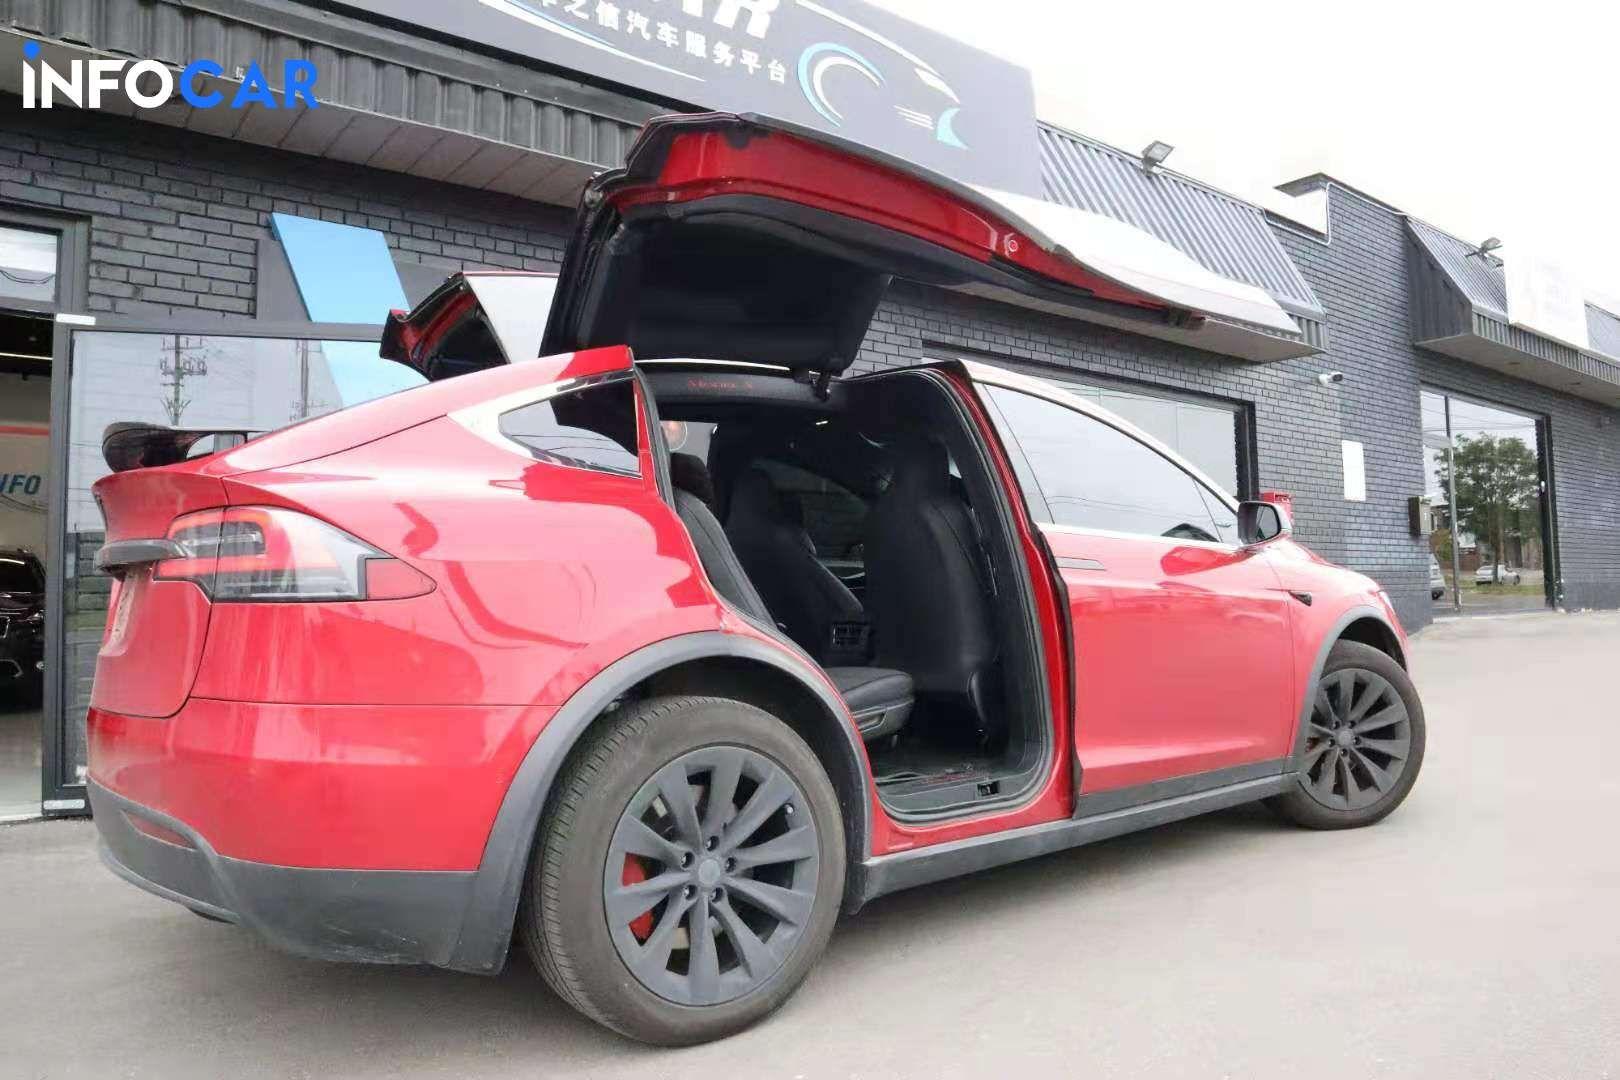 2018 Tesla Model X 100 D - INFOCAR - Toronto's Most Comprehensive New and Used Auto Trading Platform